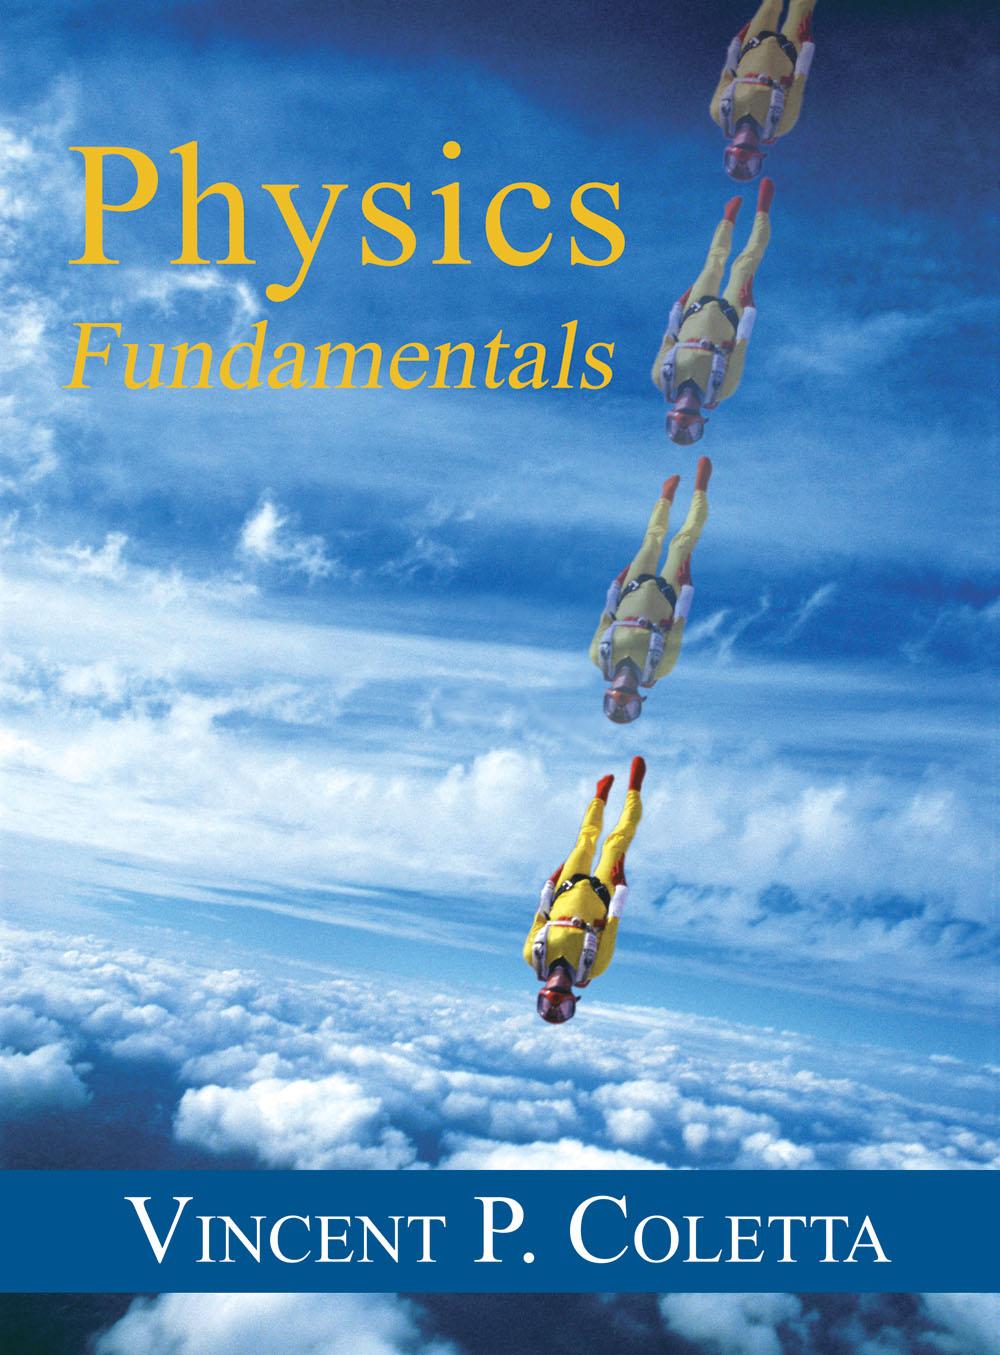 Physics Fundamentals Textbook